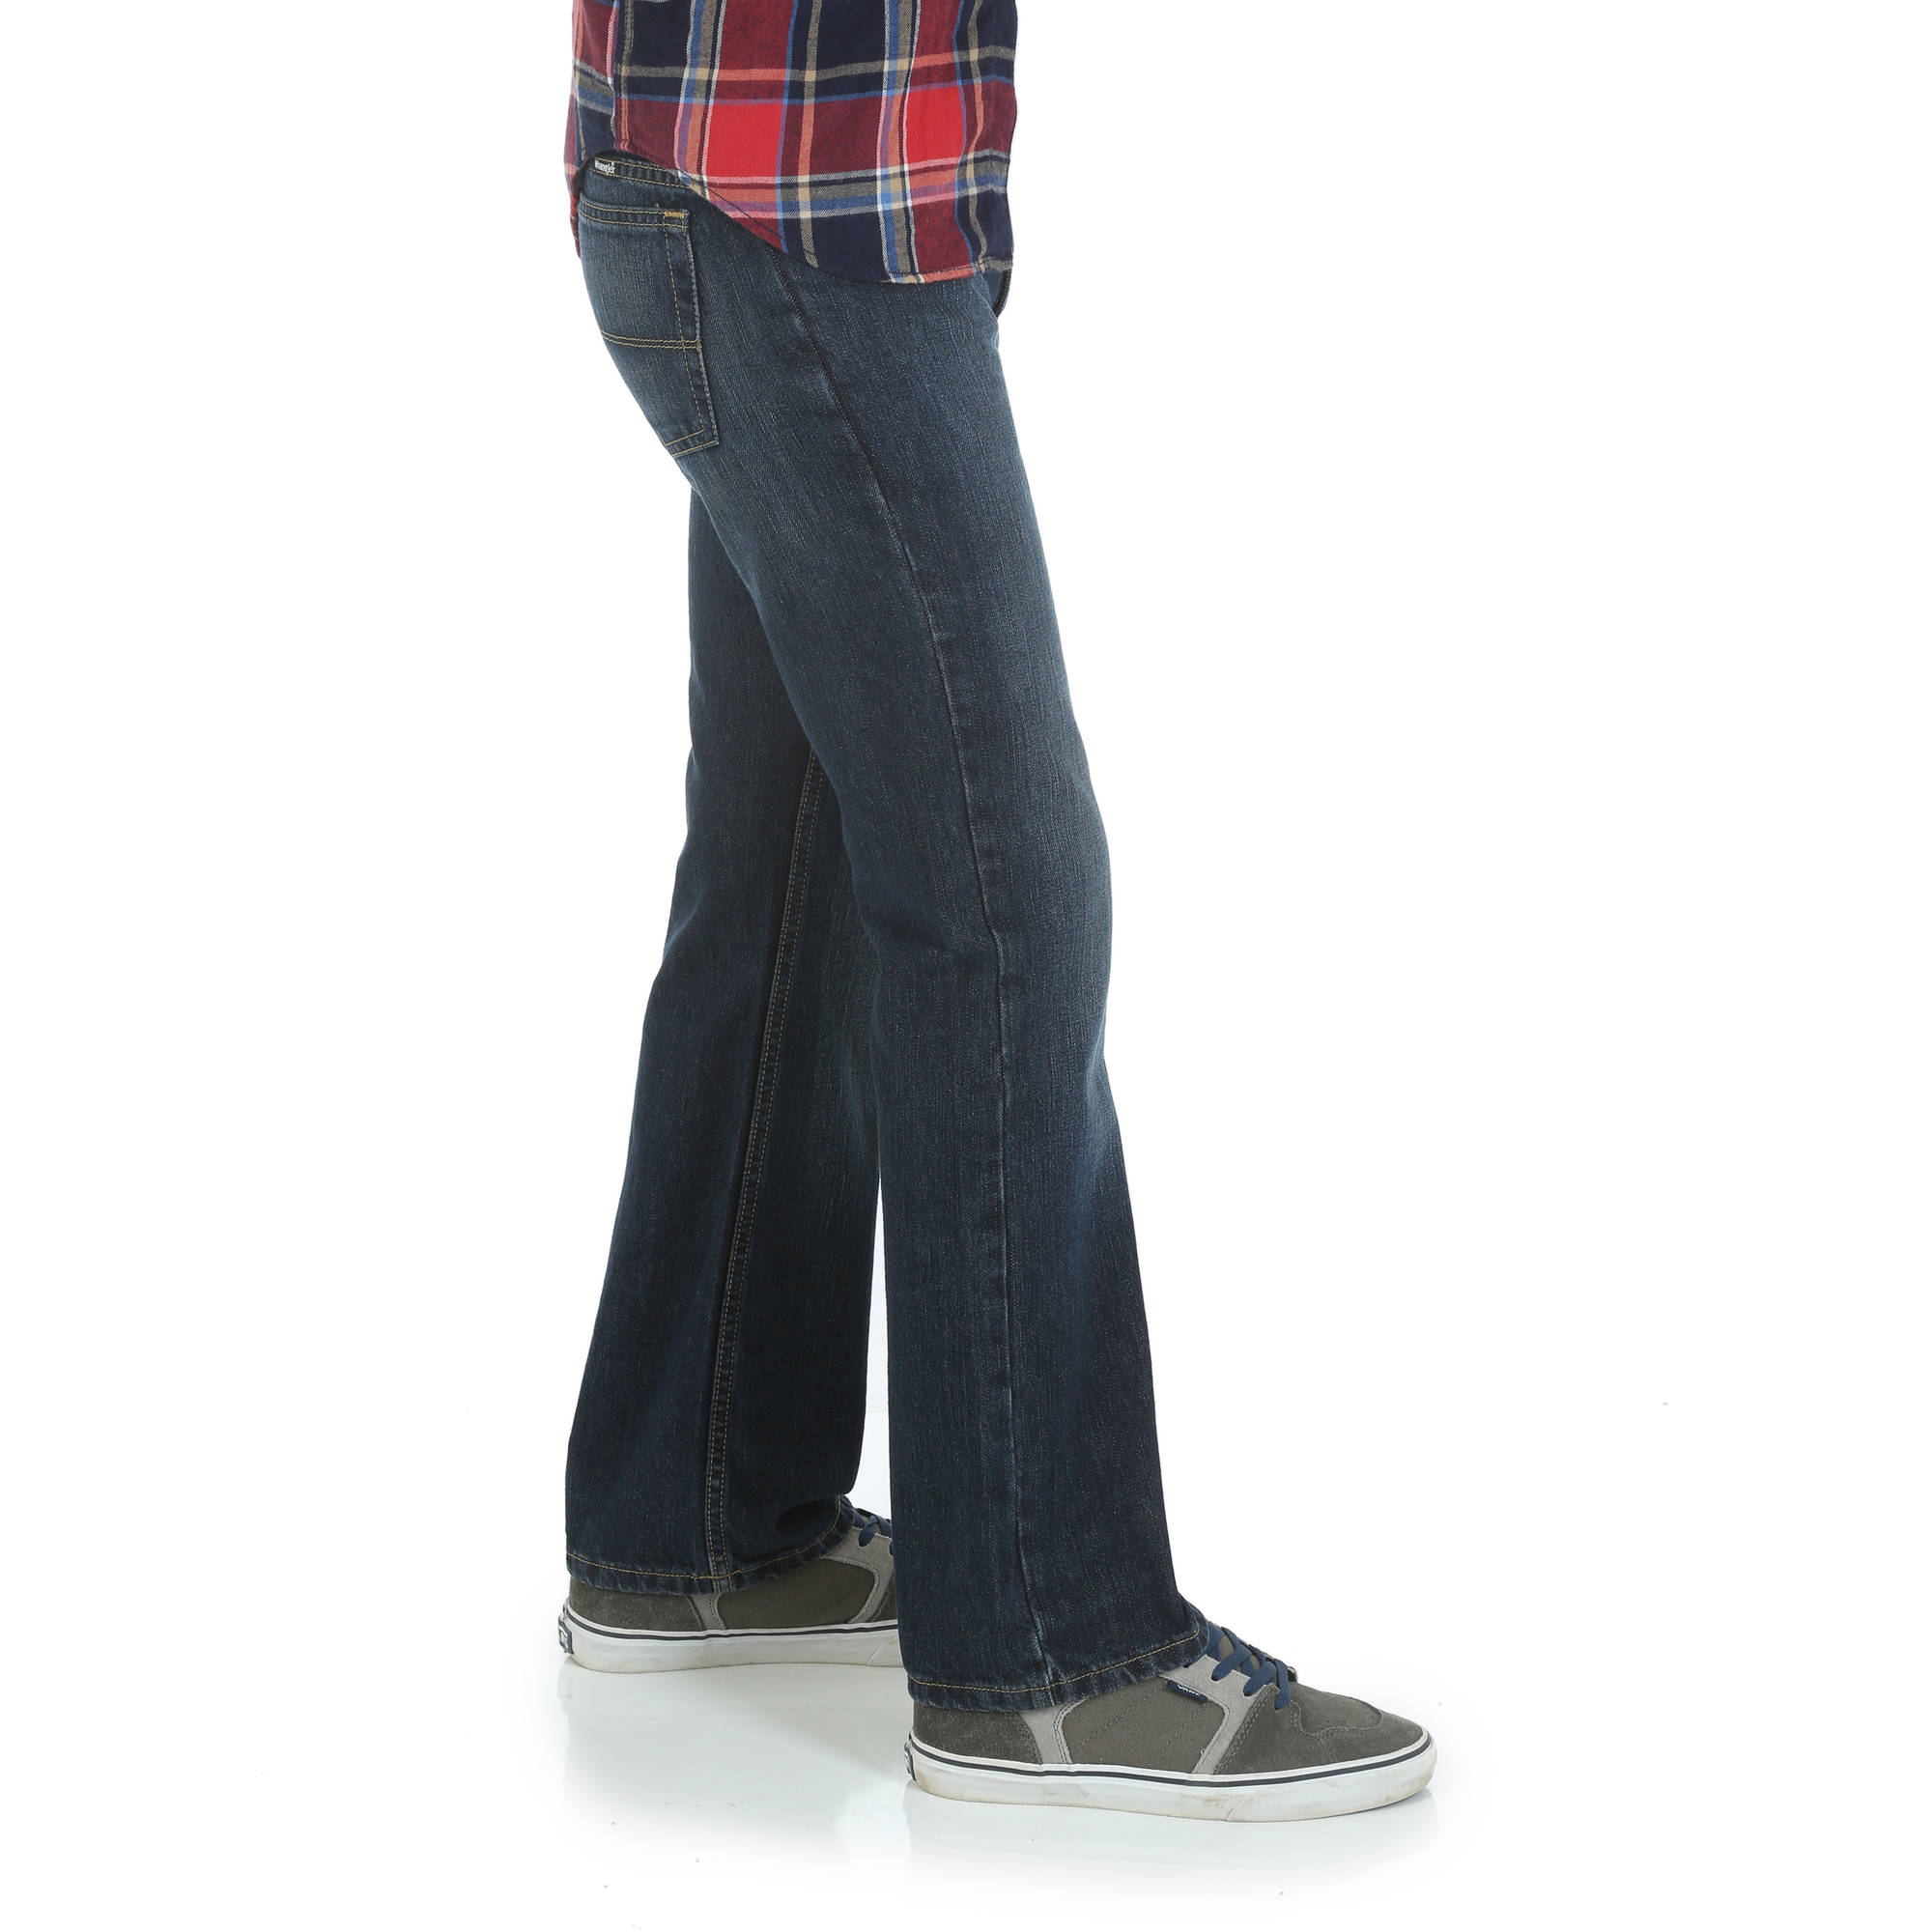 Mens bootcut jeans pattern